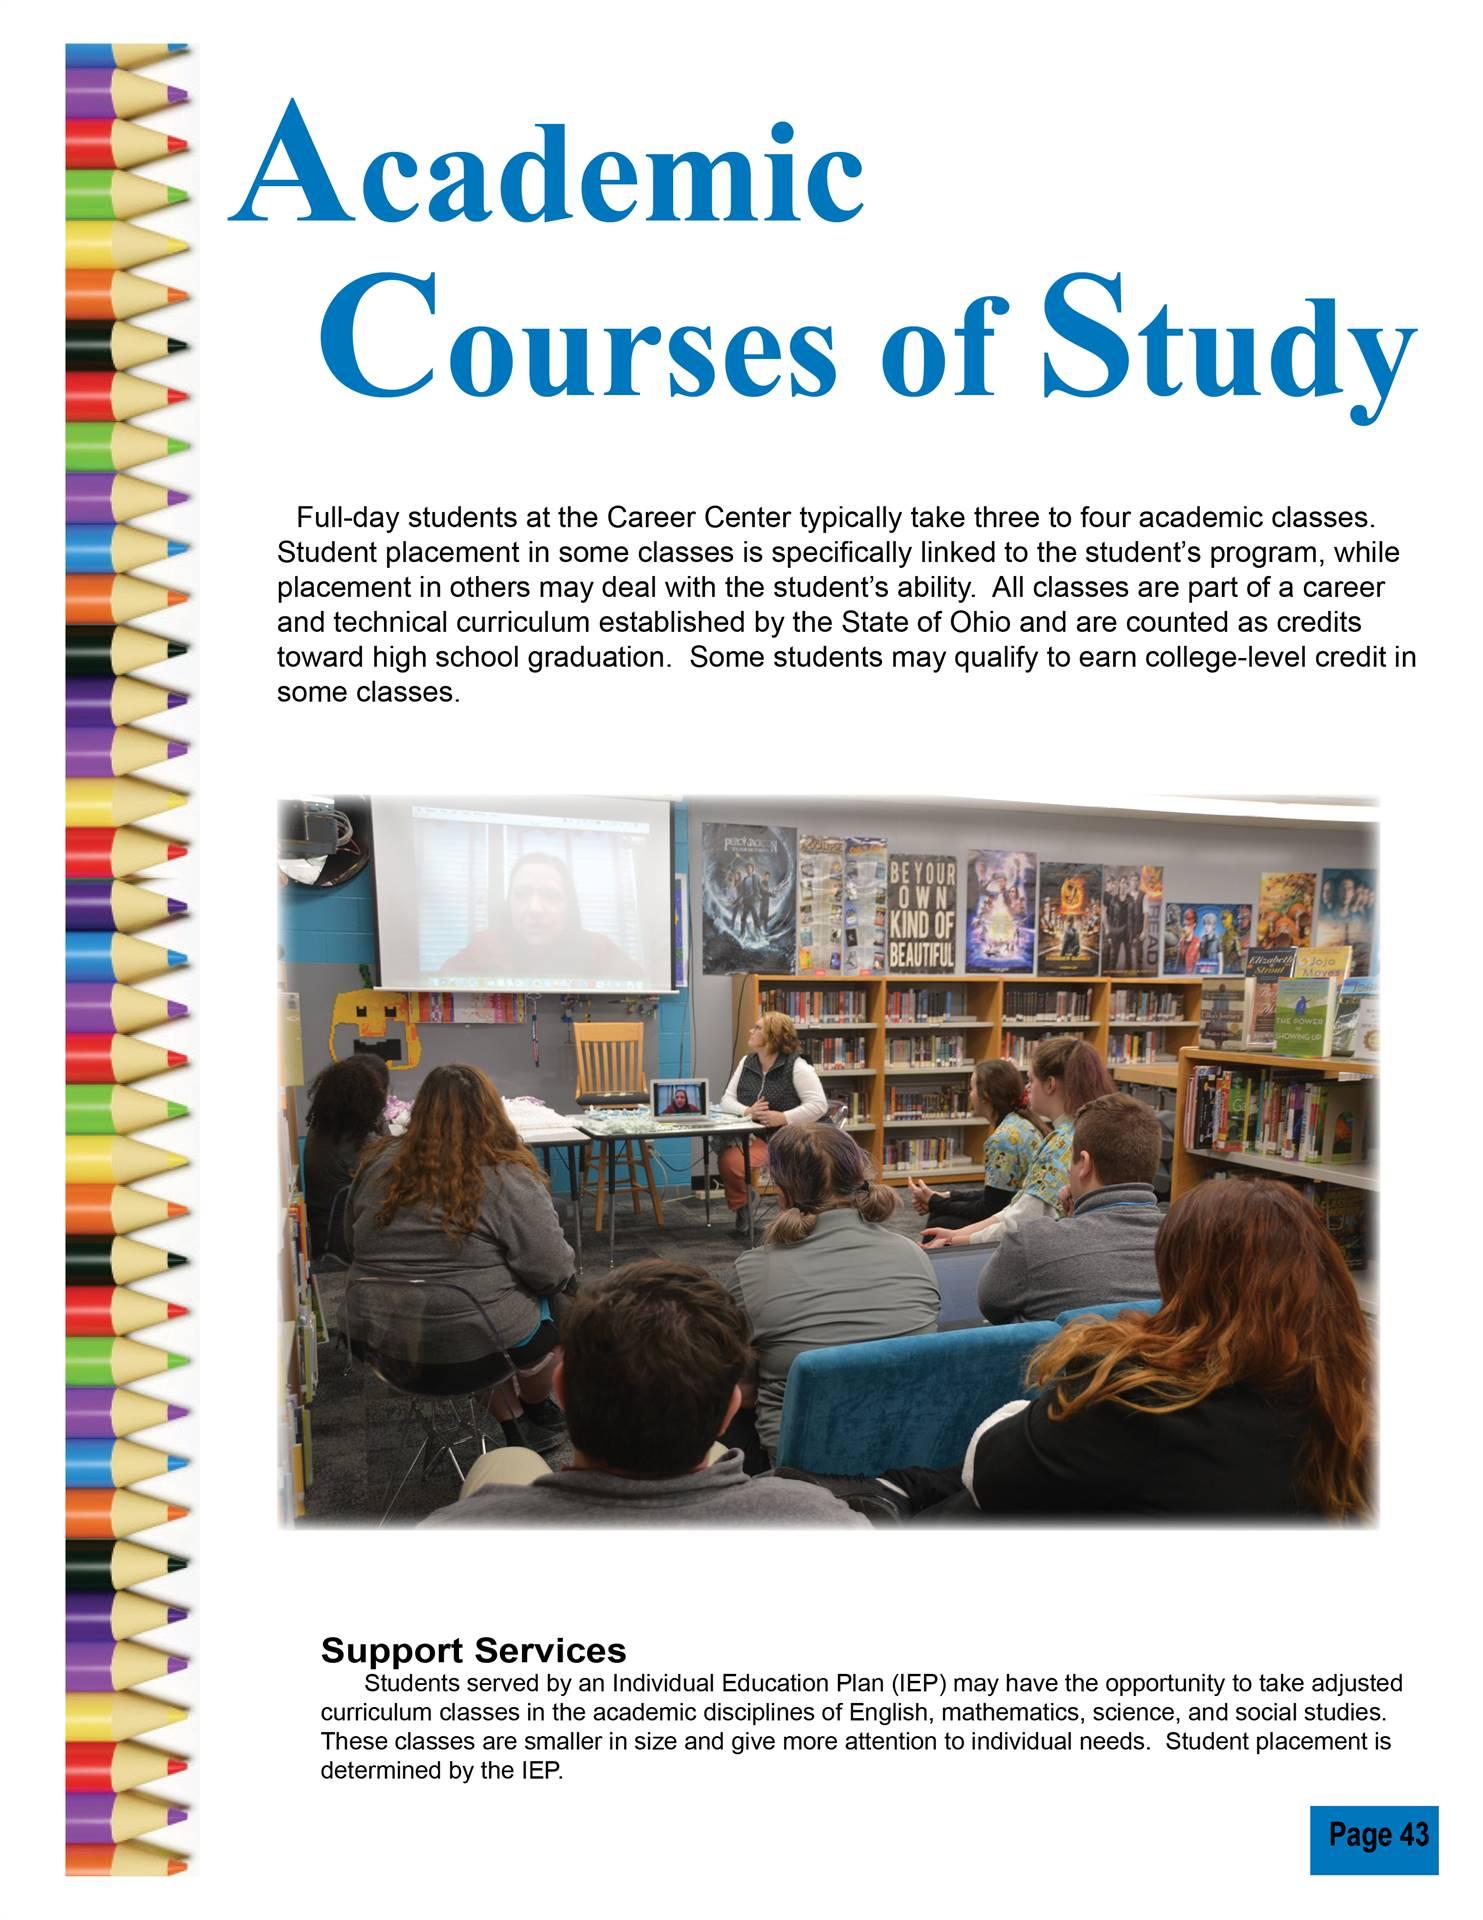 Academic Courses of Study